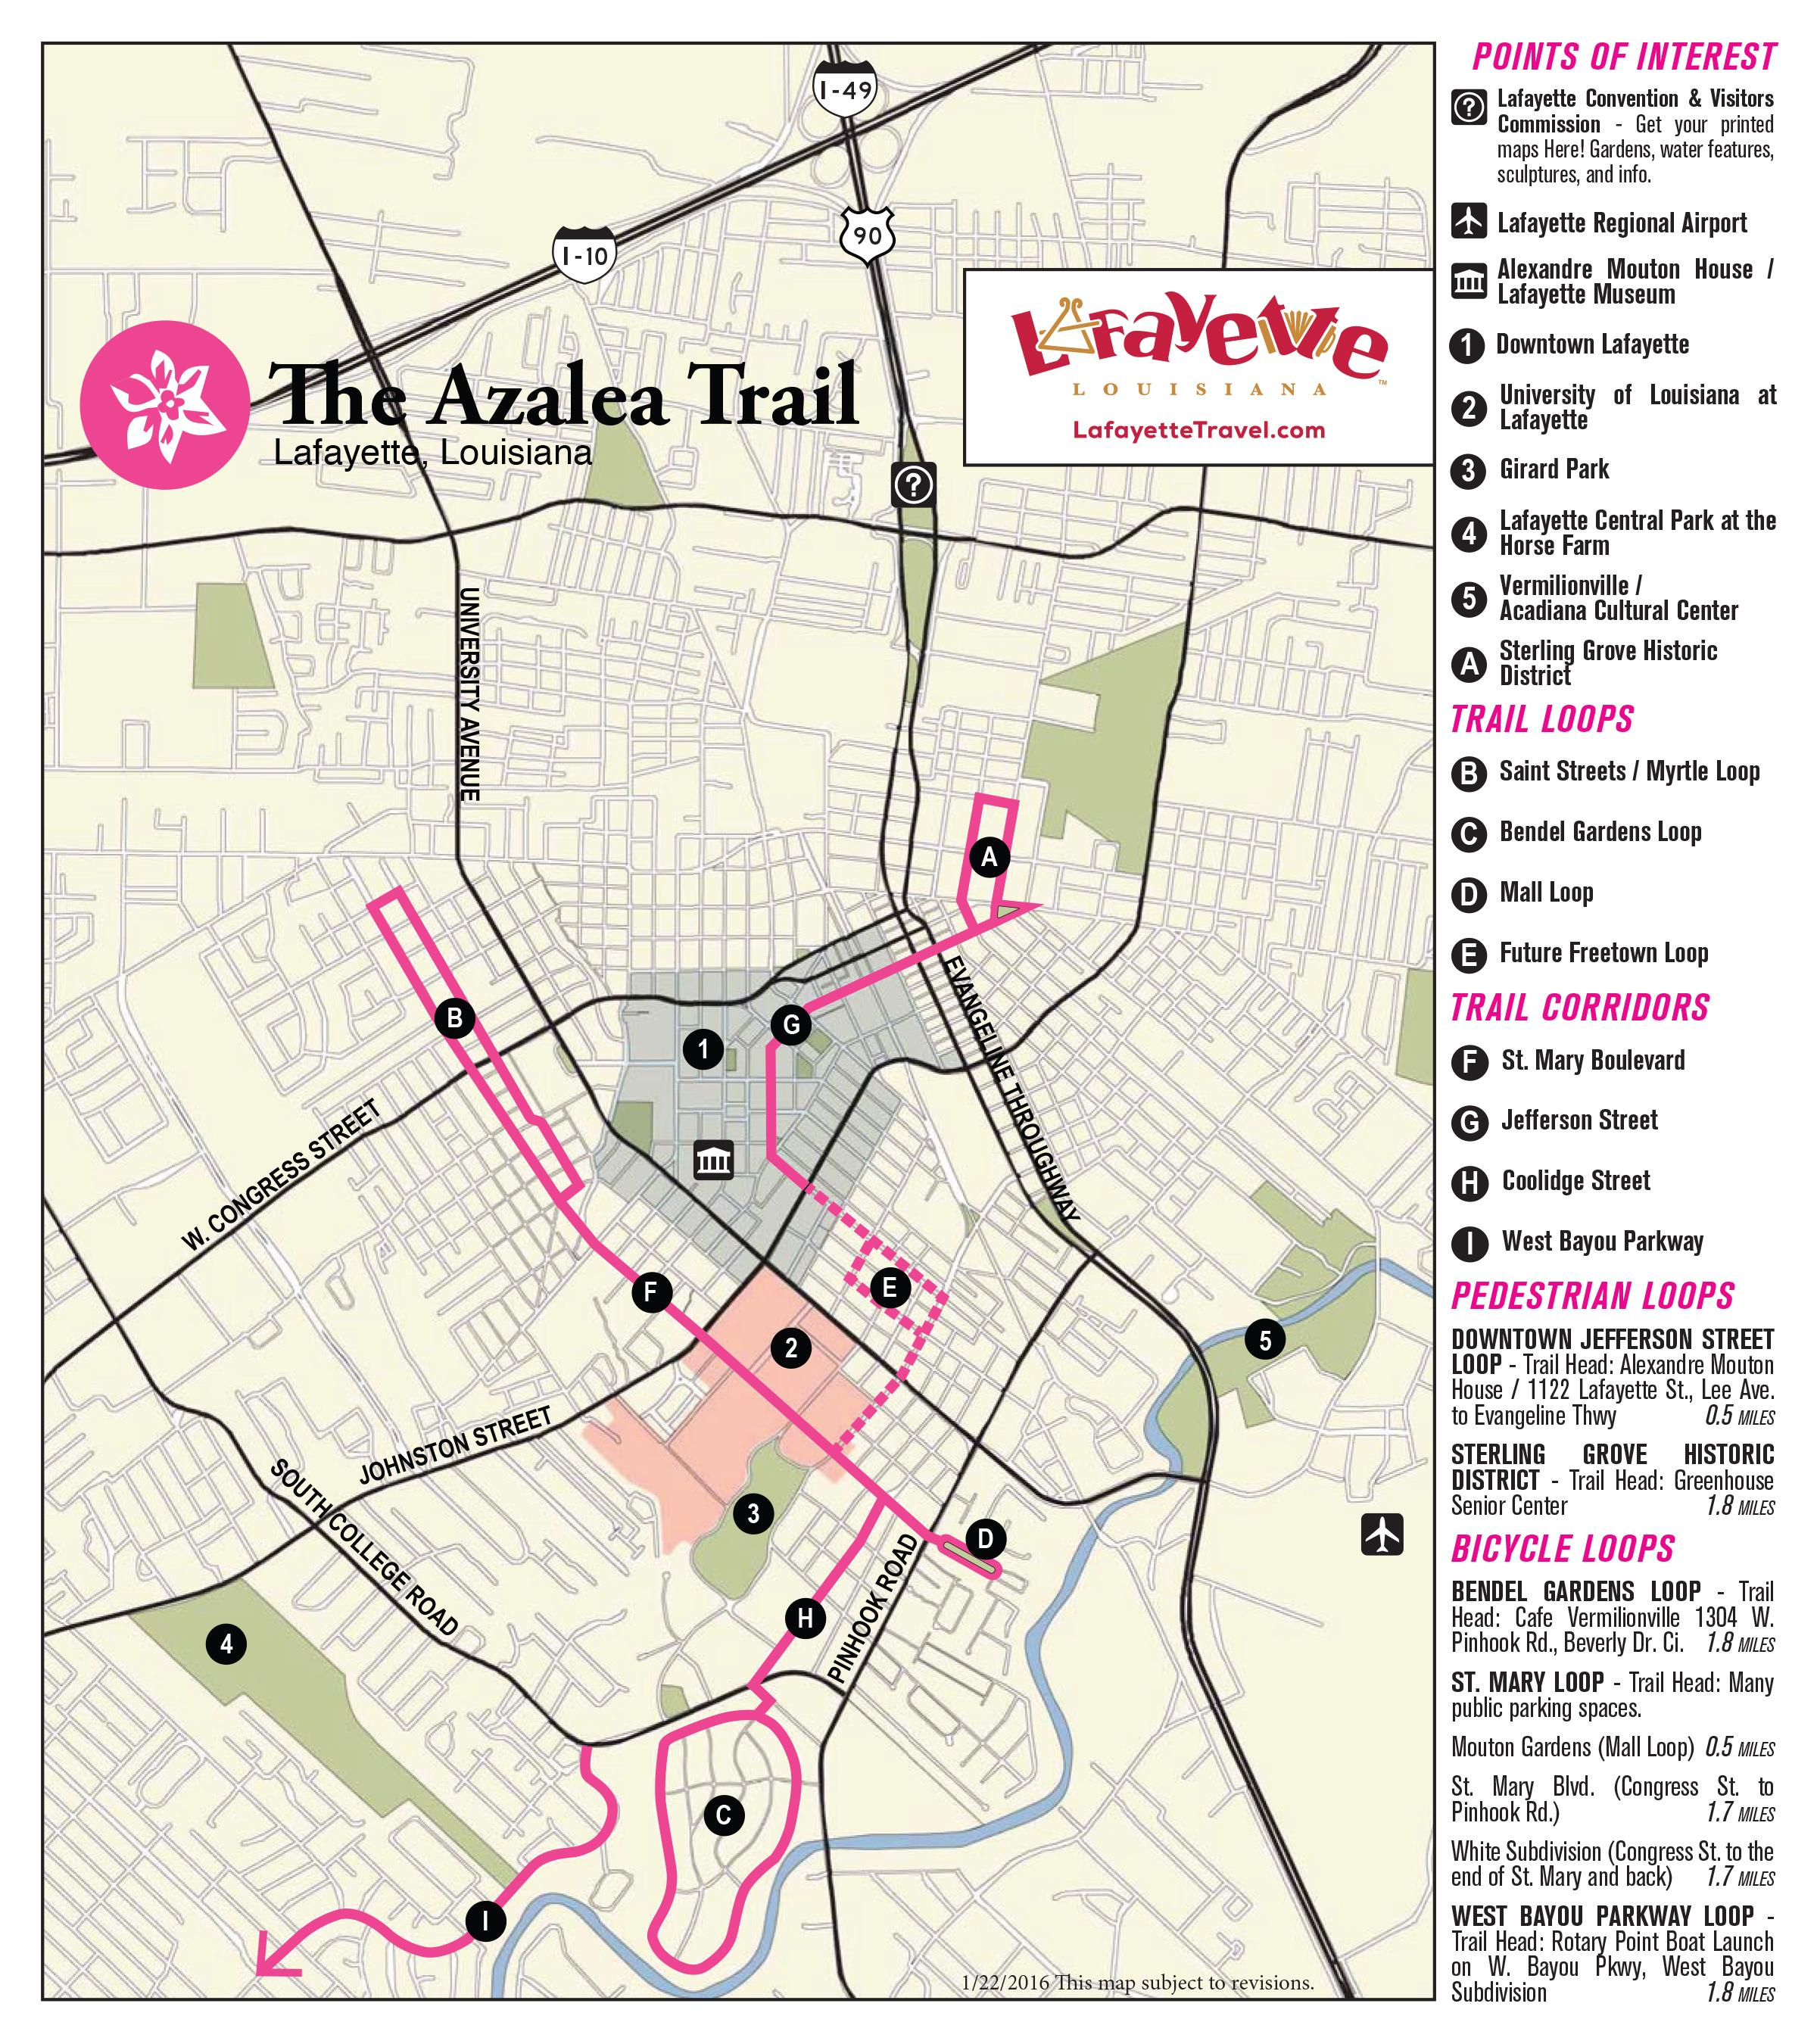 Lafayette Azalea Trail Map